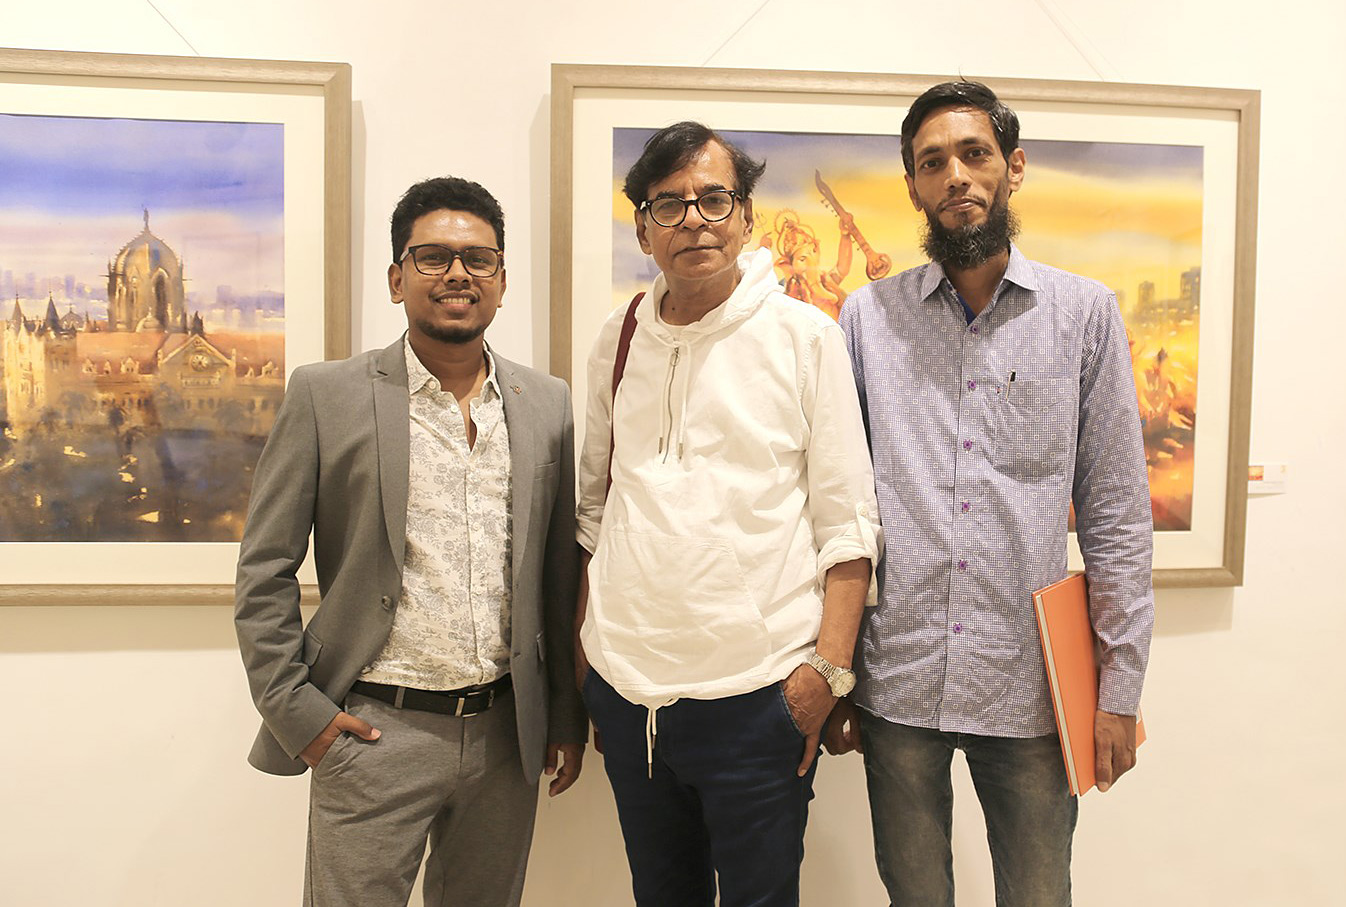 ananta-mandal-jehangir-art-gallery-mumbai-exhibition